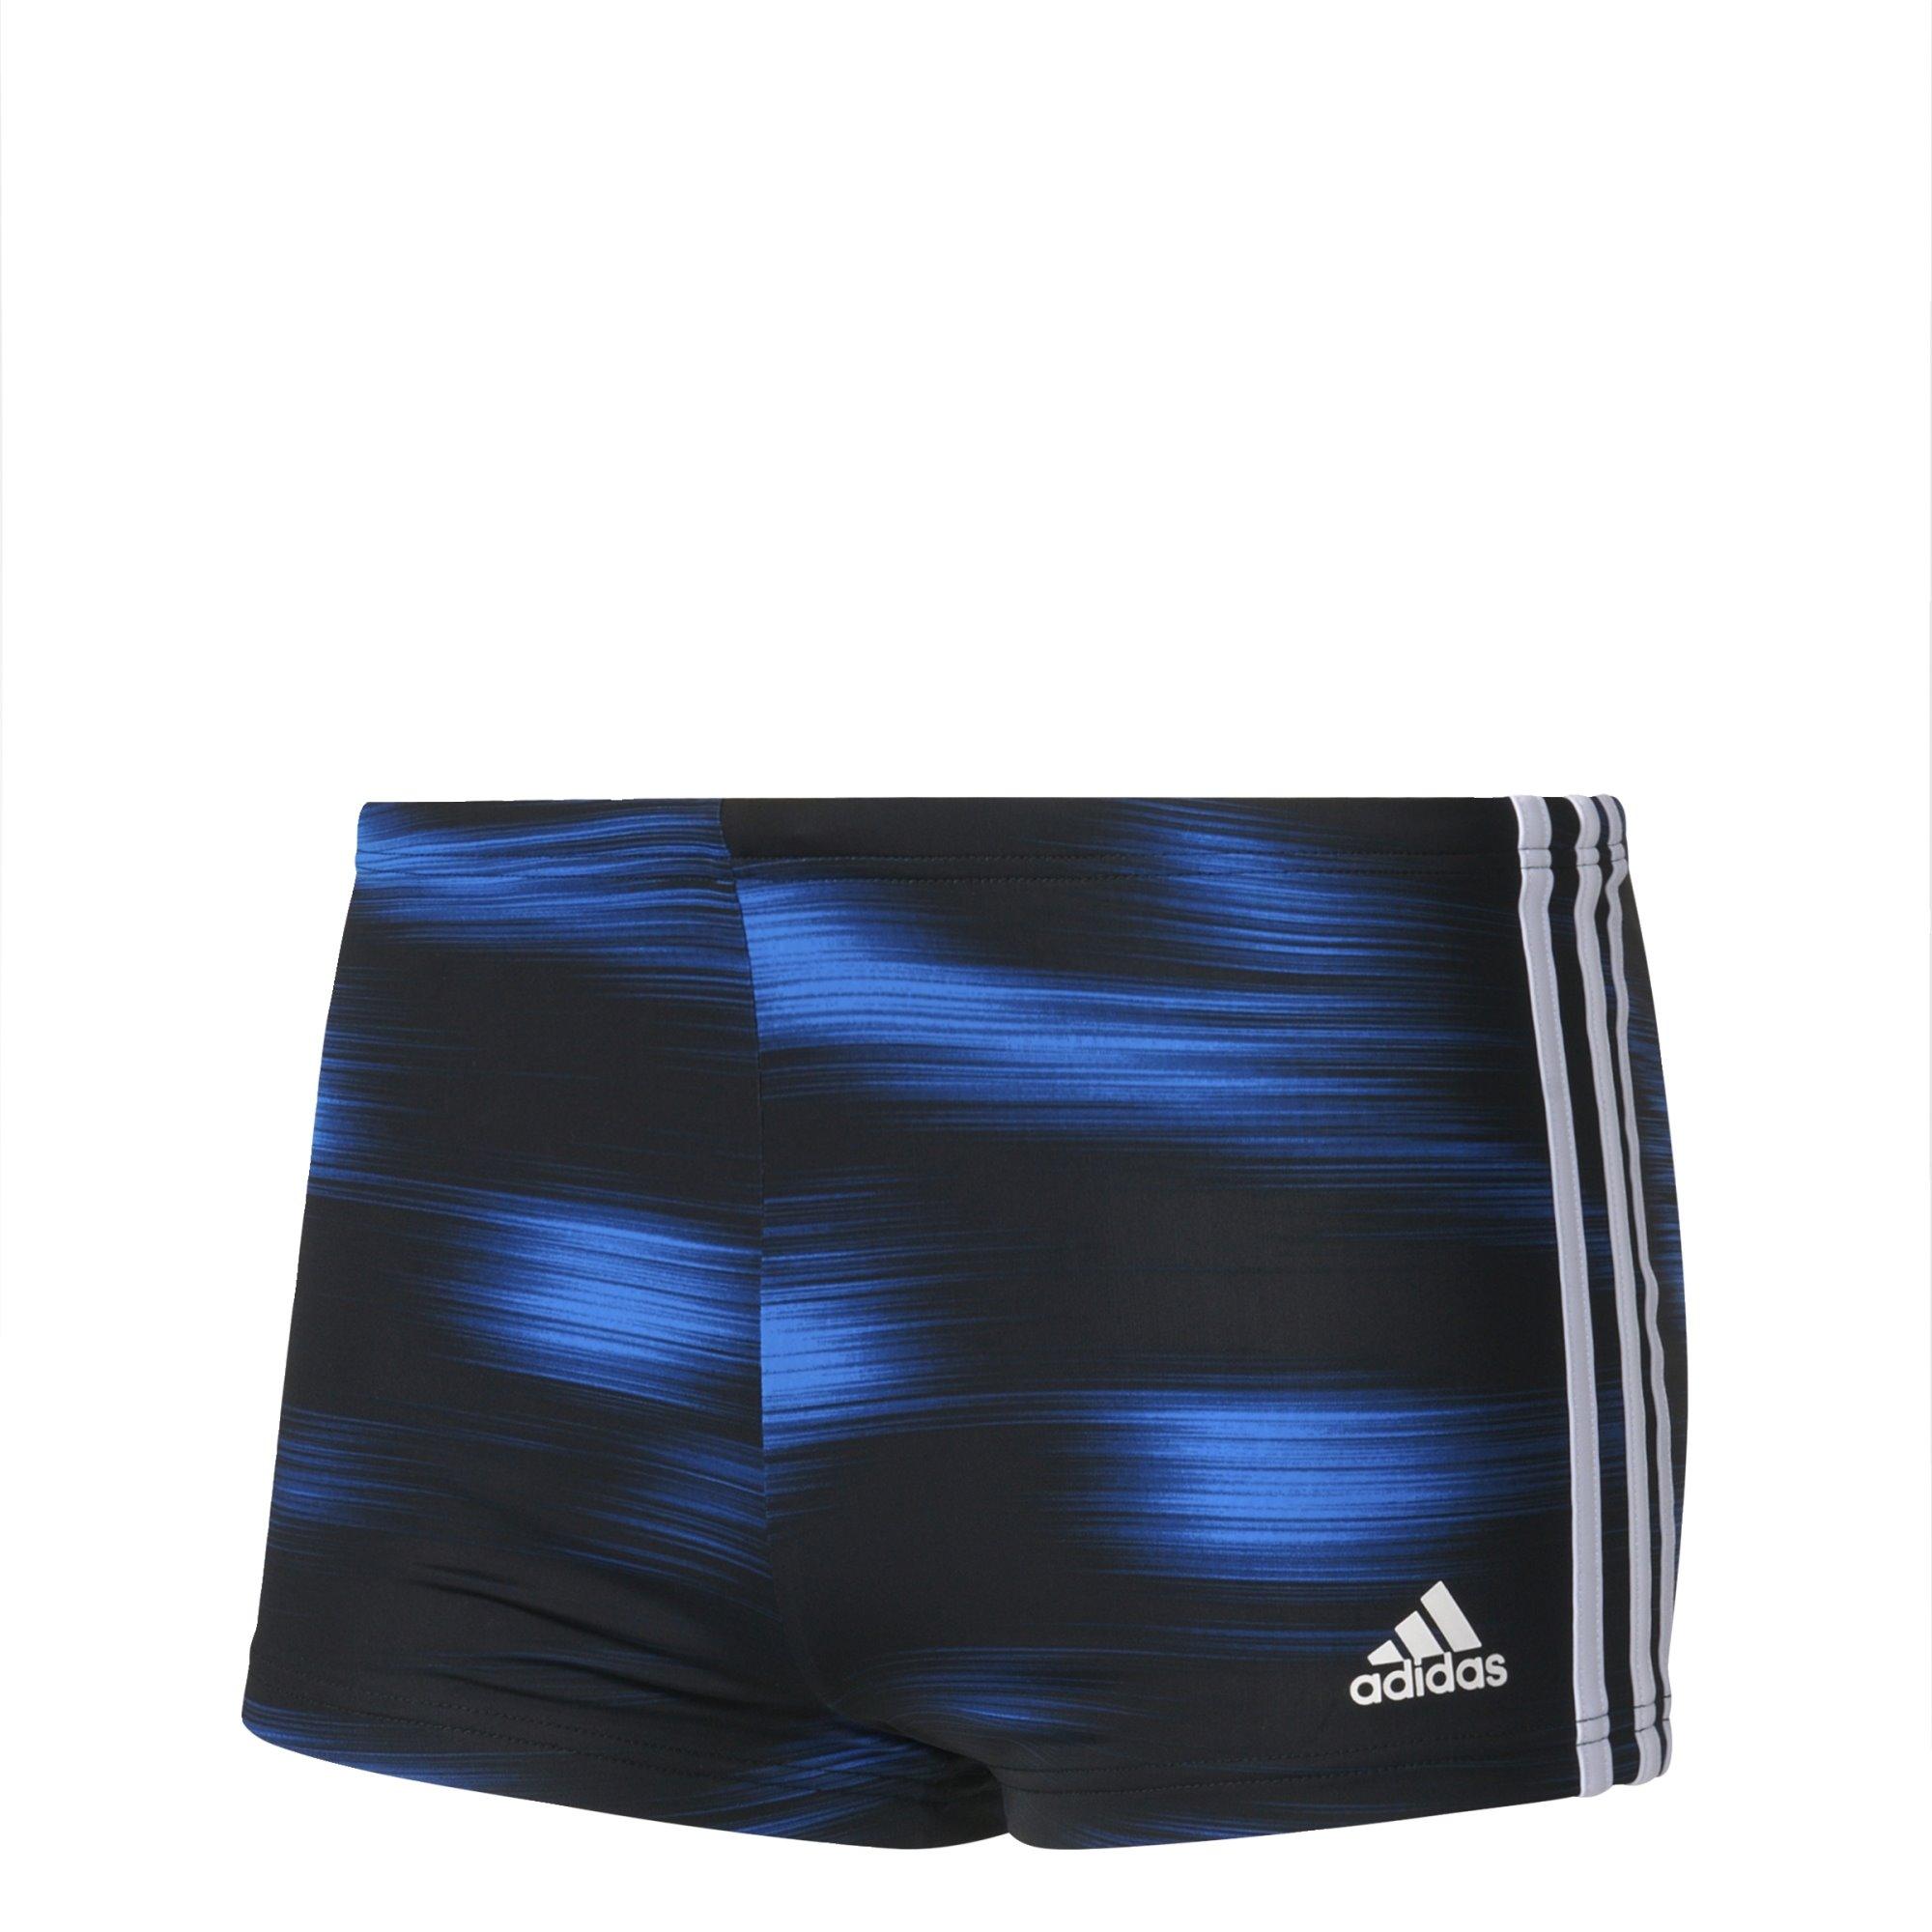 Adidas Inf Efp1 Bx Heren zwembroek